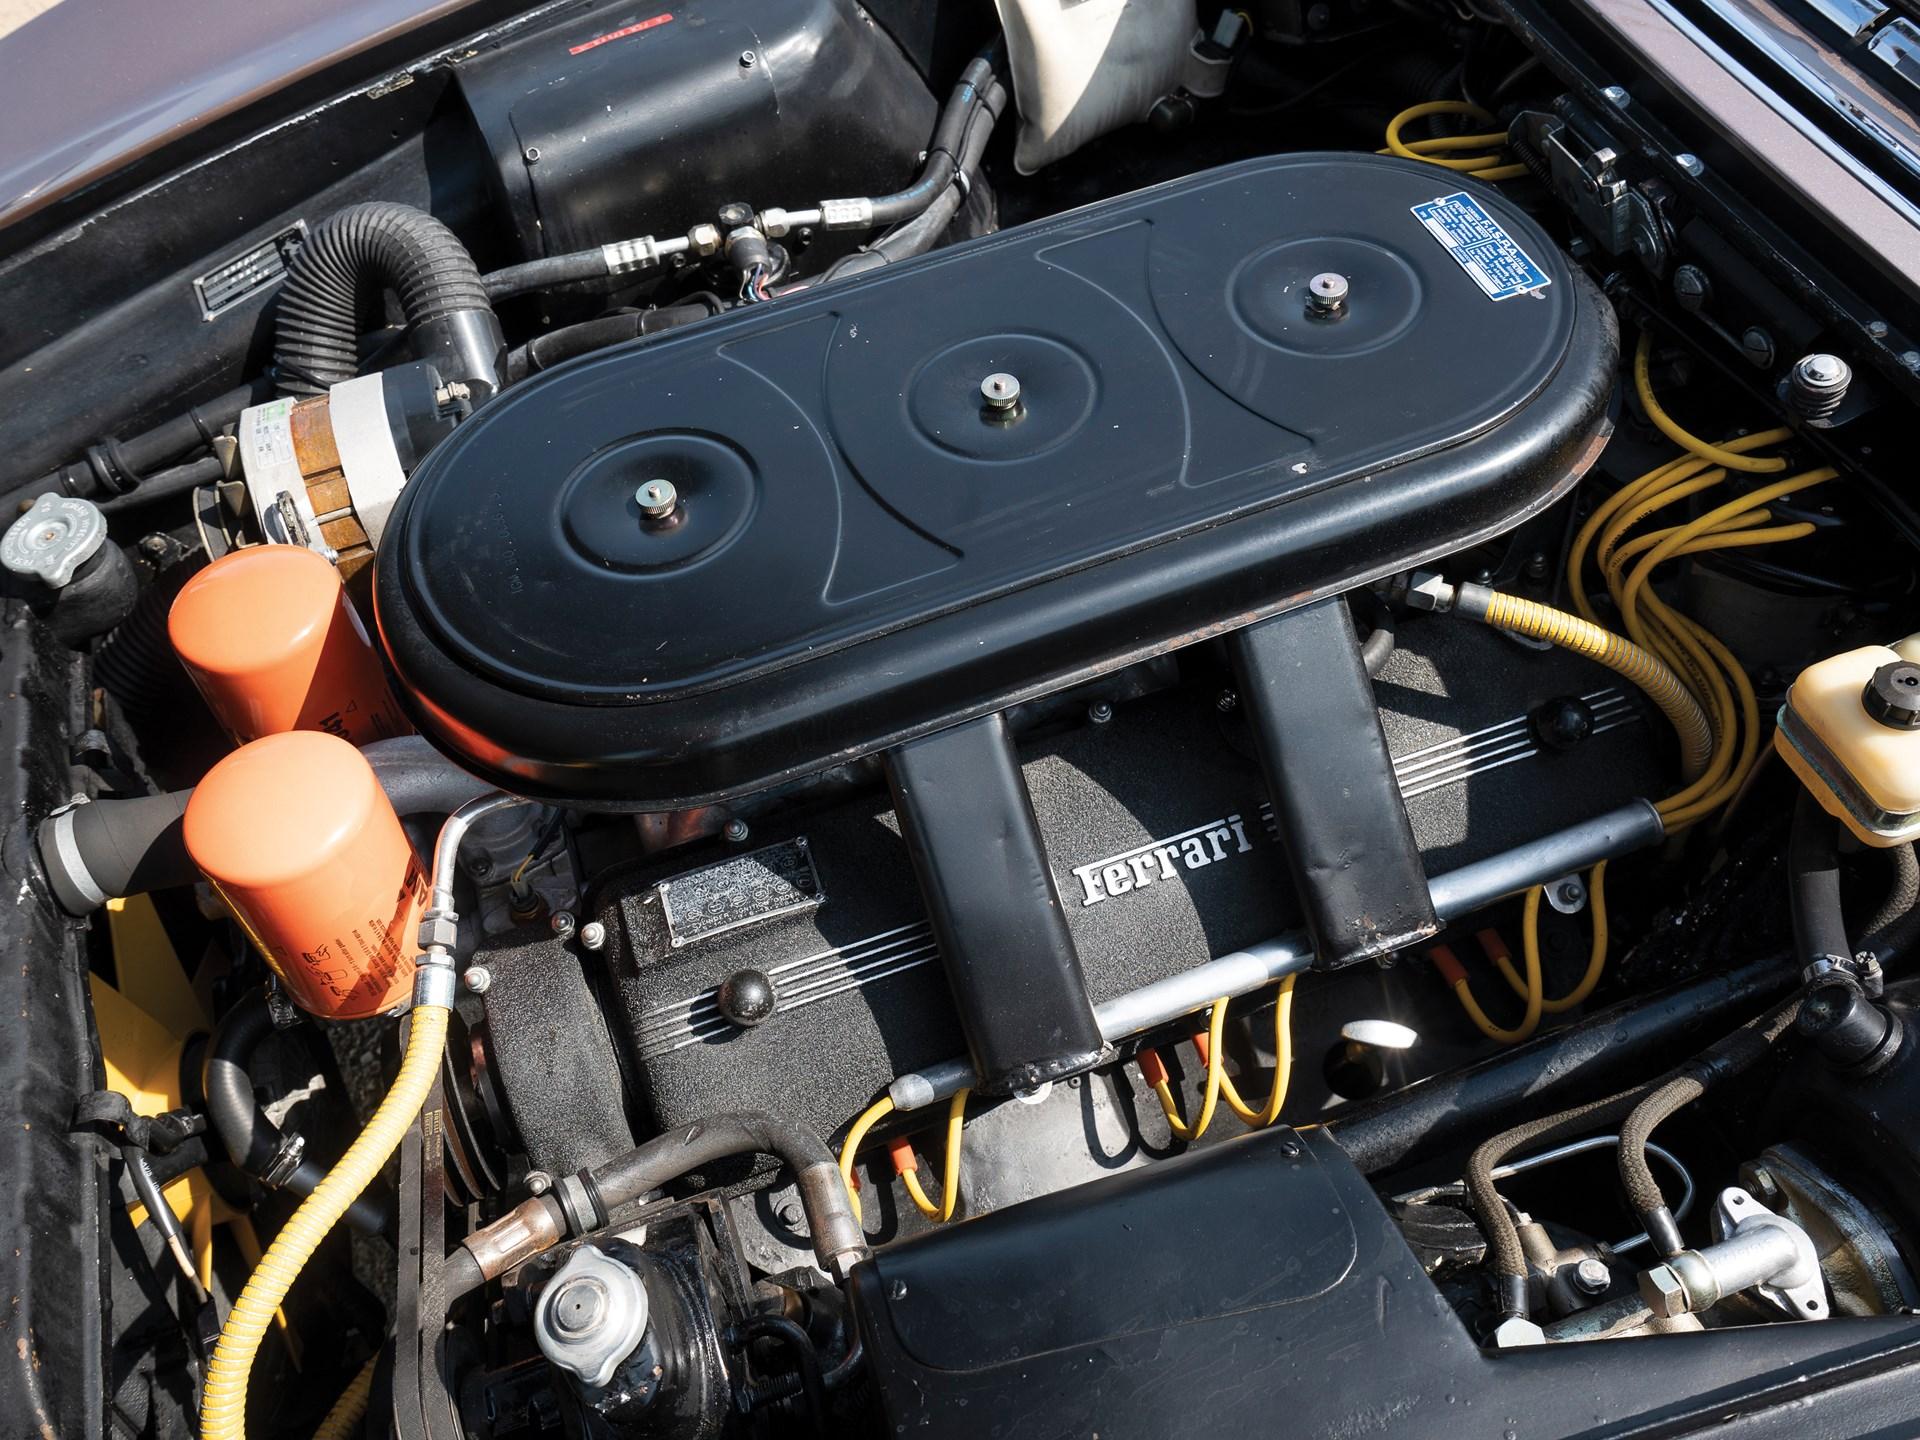 1965 Ferrari 330 GT 2+2 Shooting Brake engine